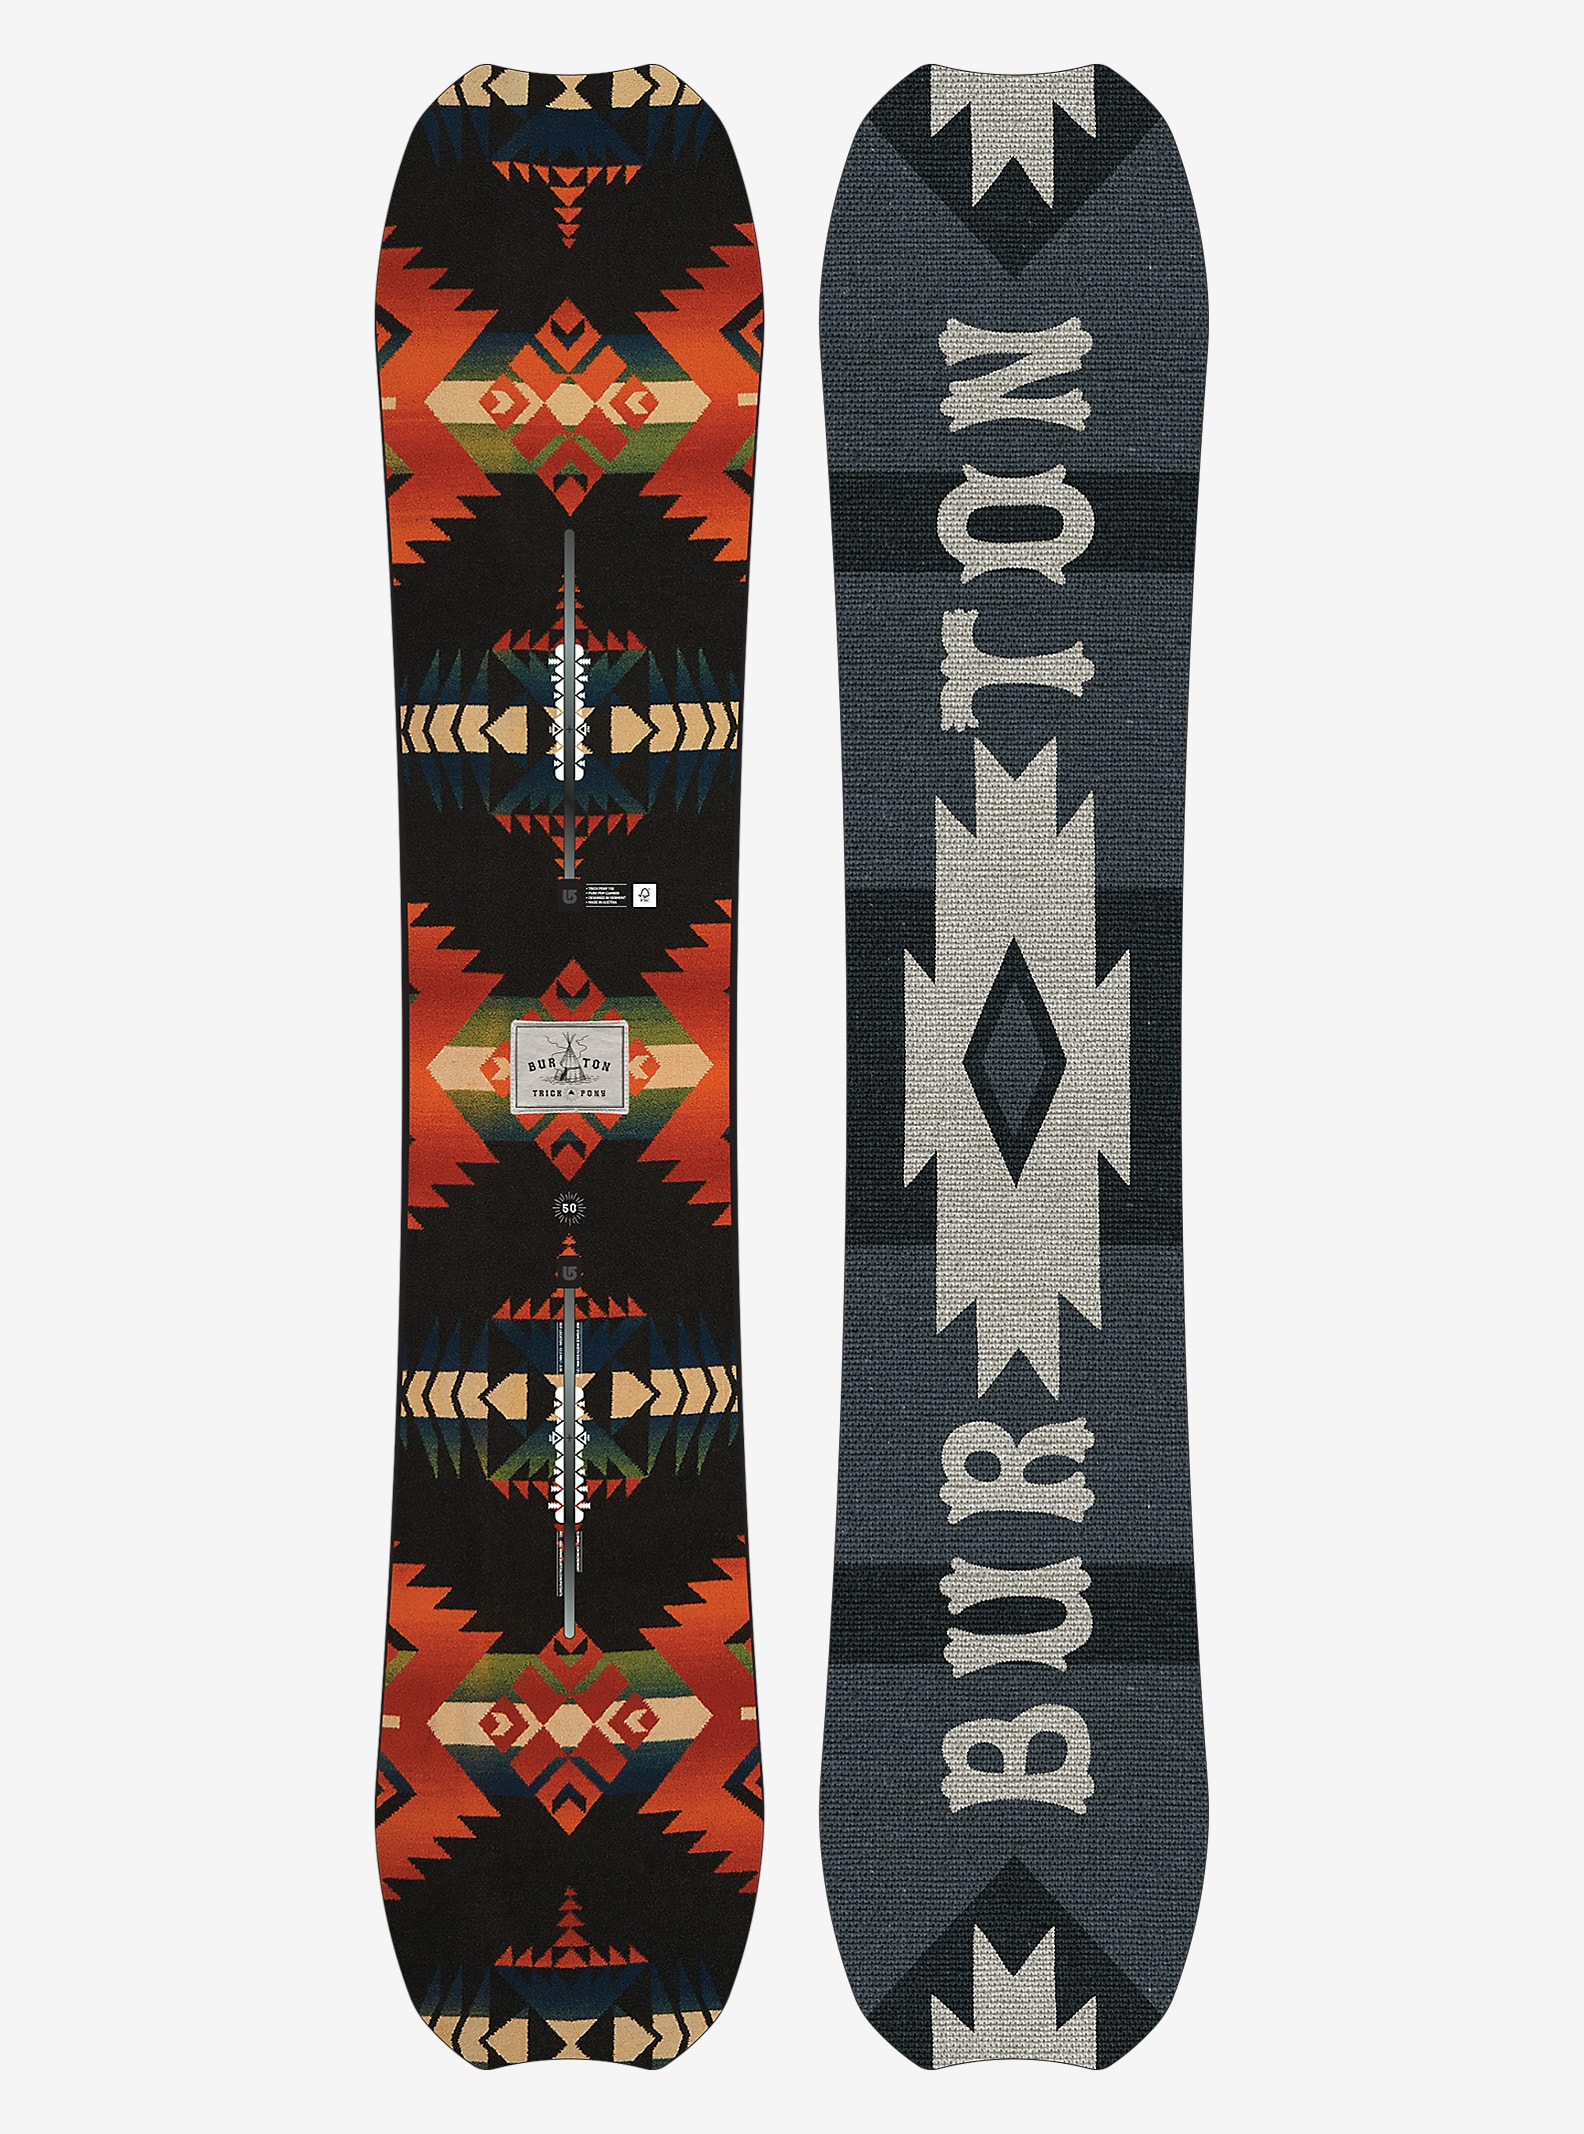 Burton Trick Pony Snowboard shown in 150